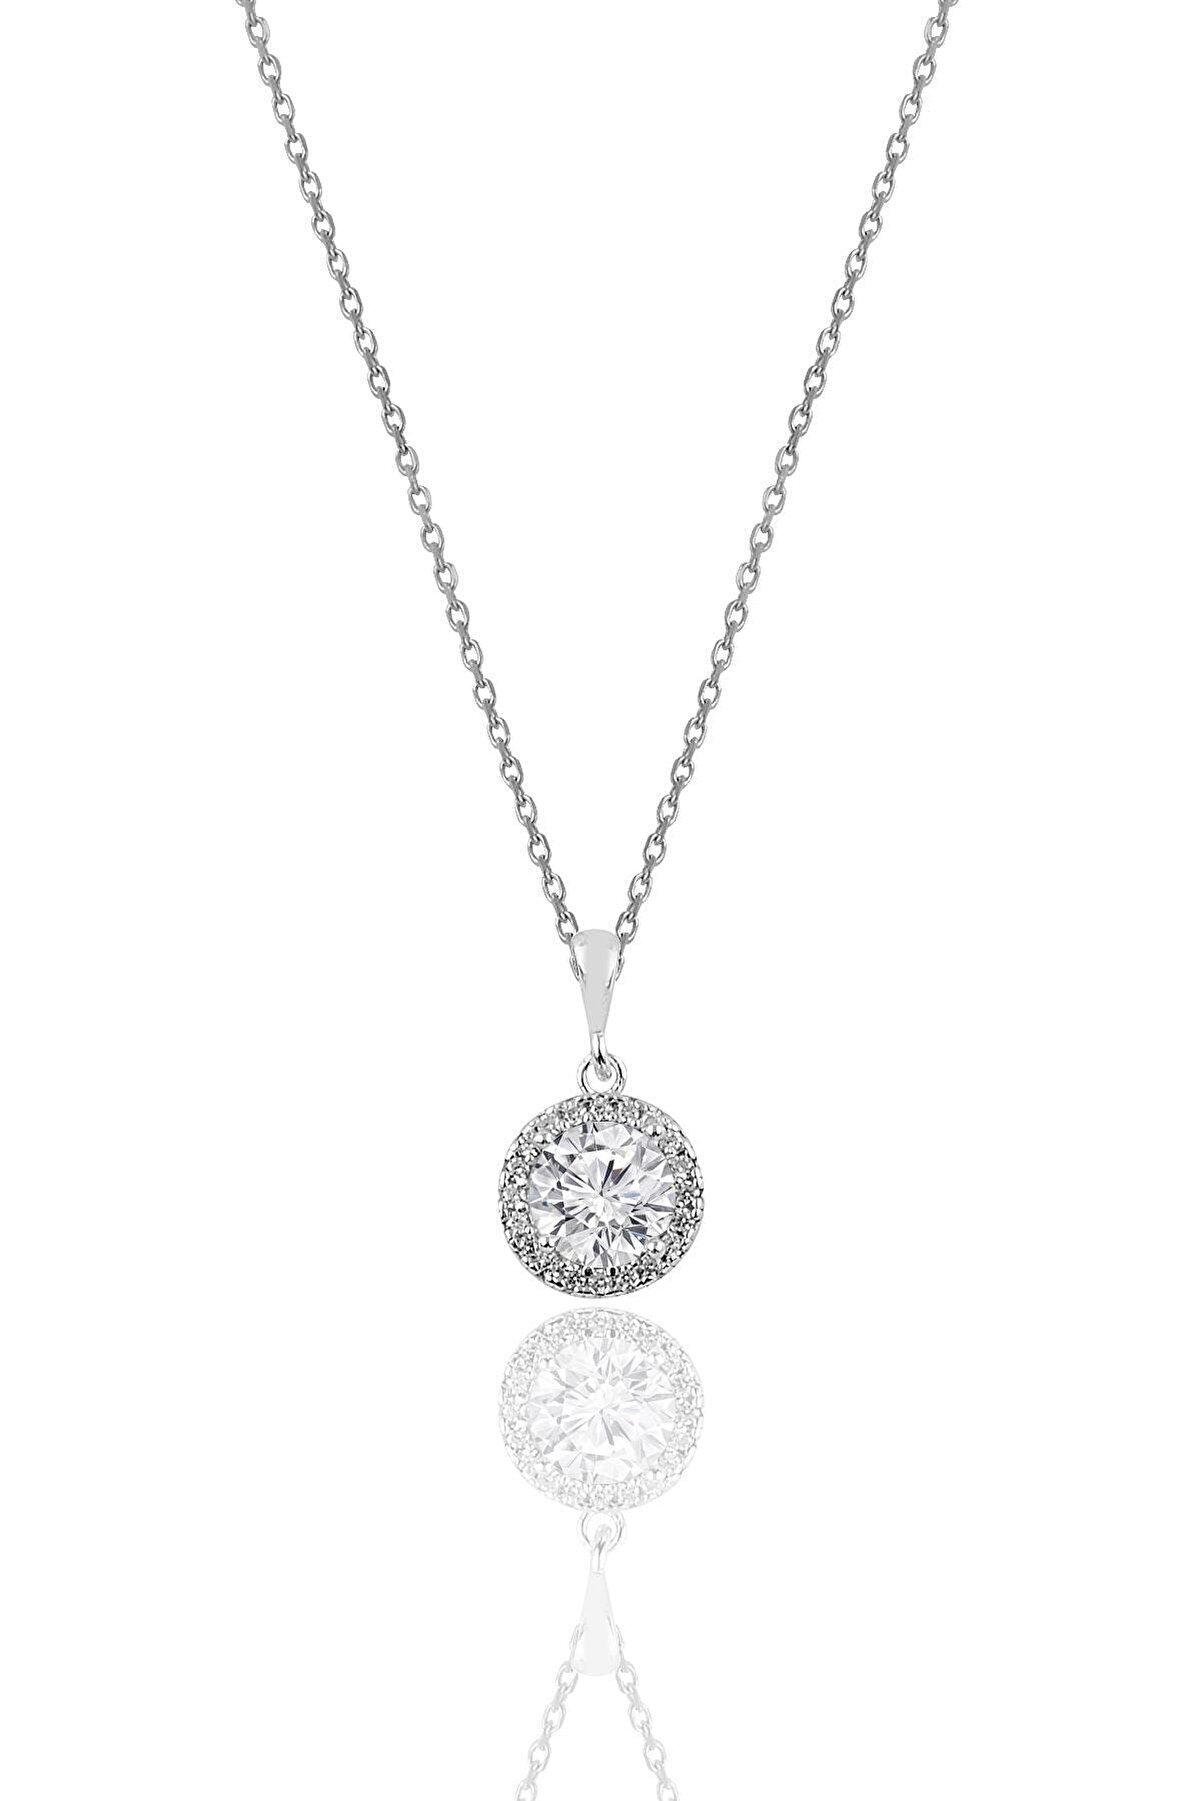 Söğütlü Silver Gümüş Zirkon Taşlı Yuvarlak Pırlanta Montürlü Gümüş Kolye